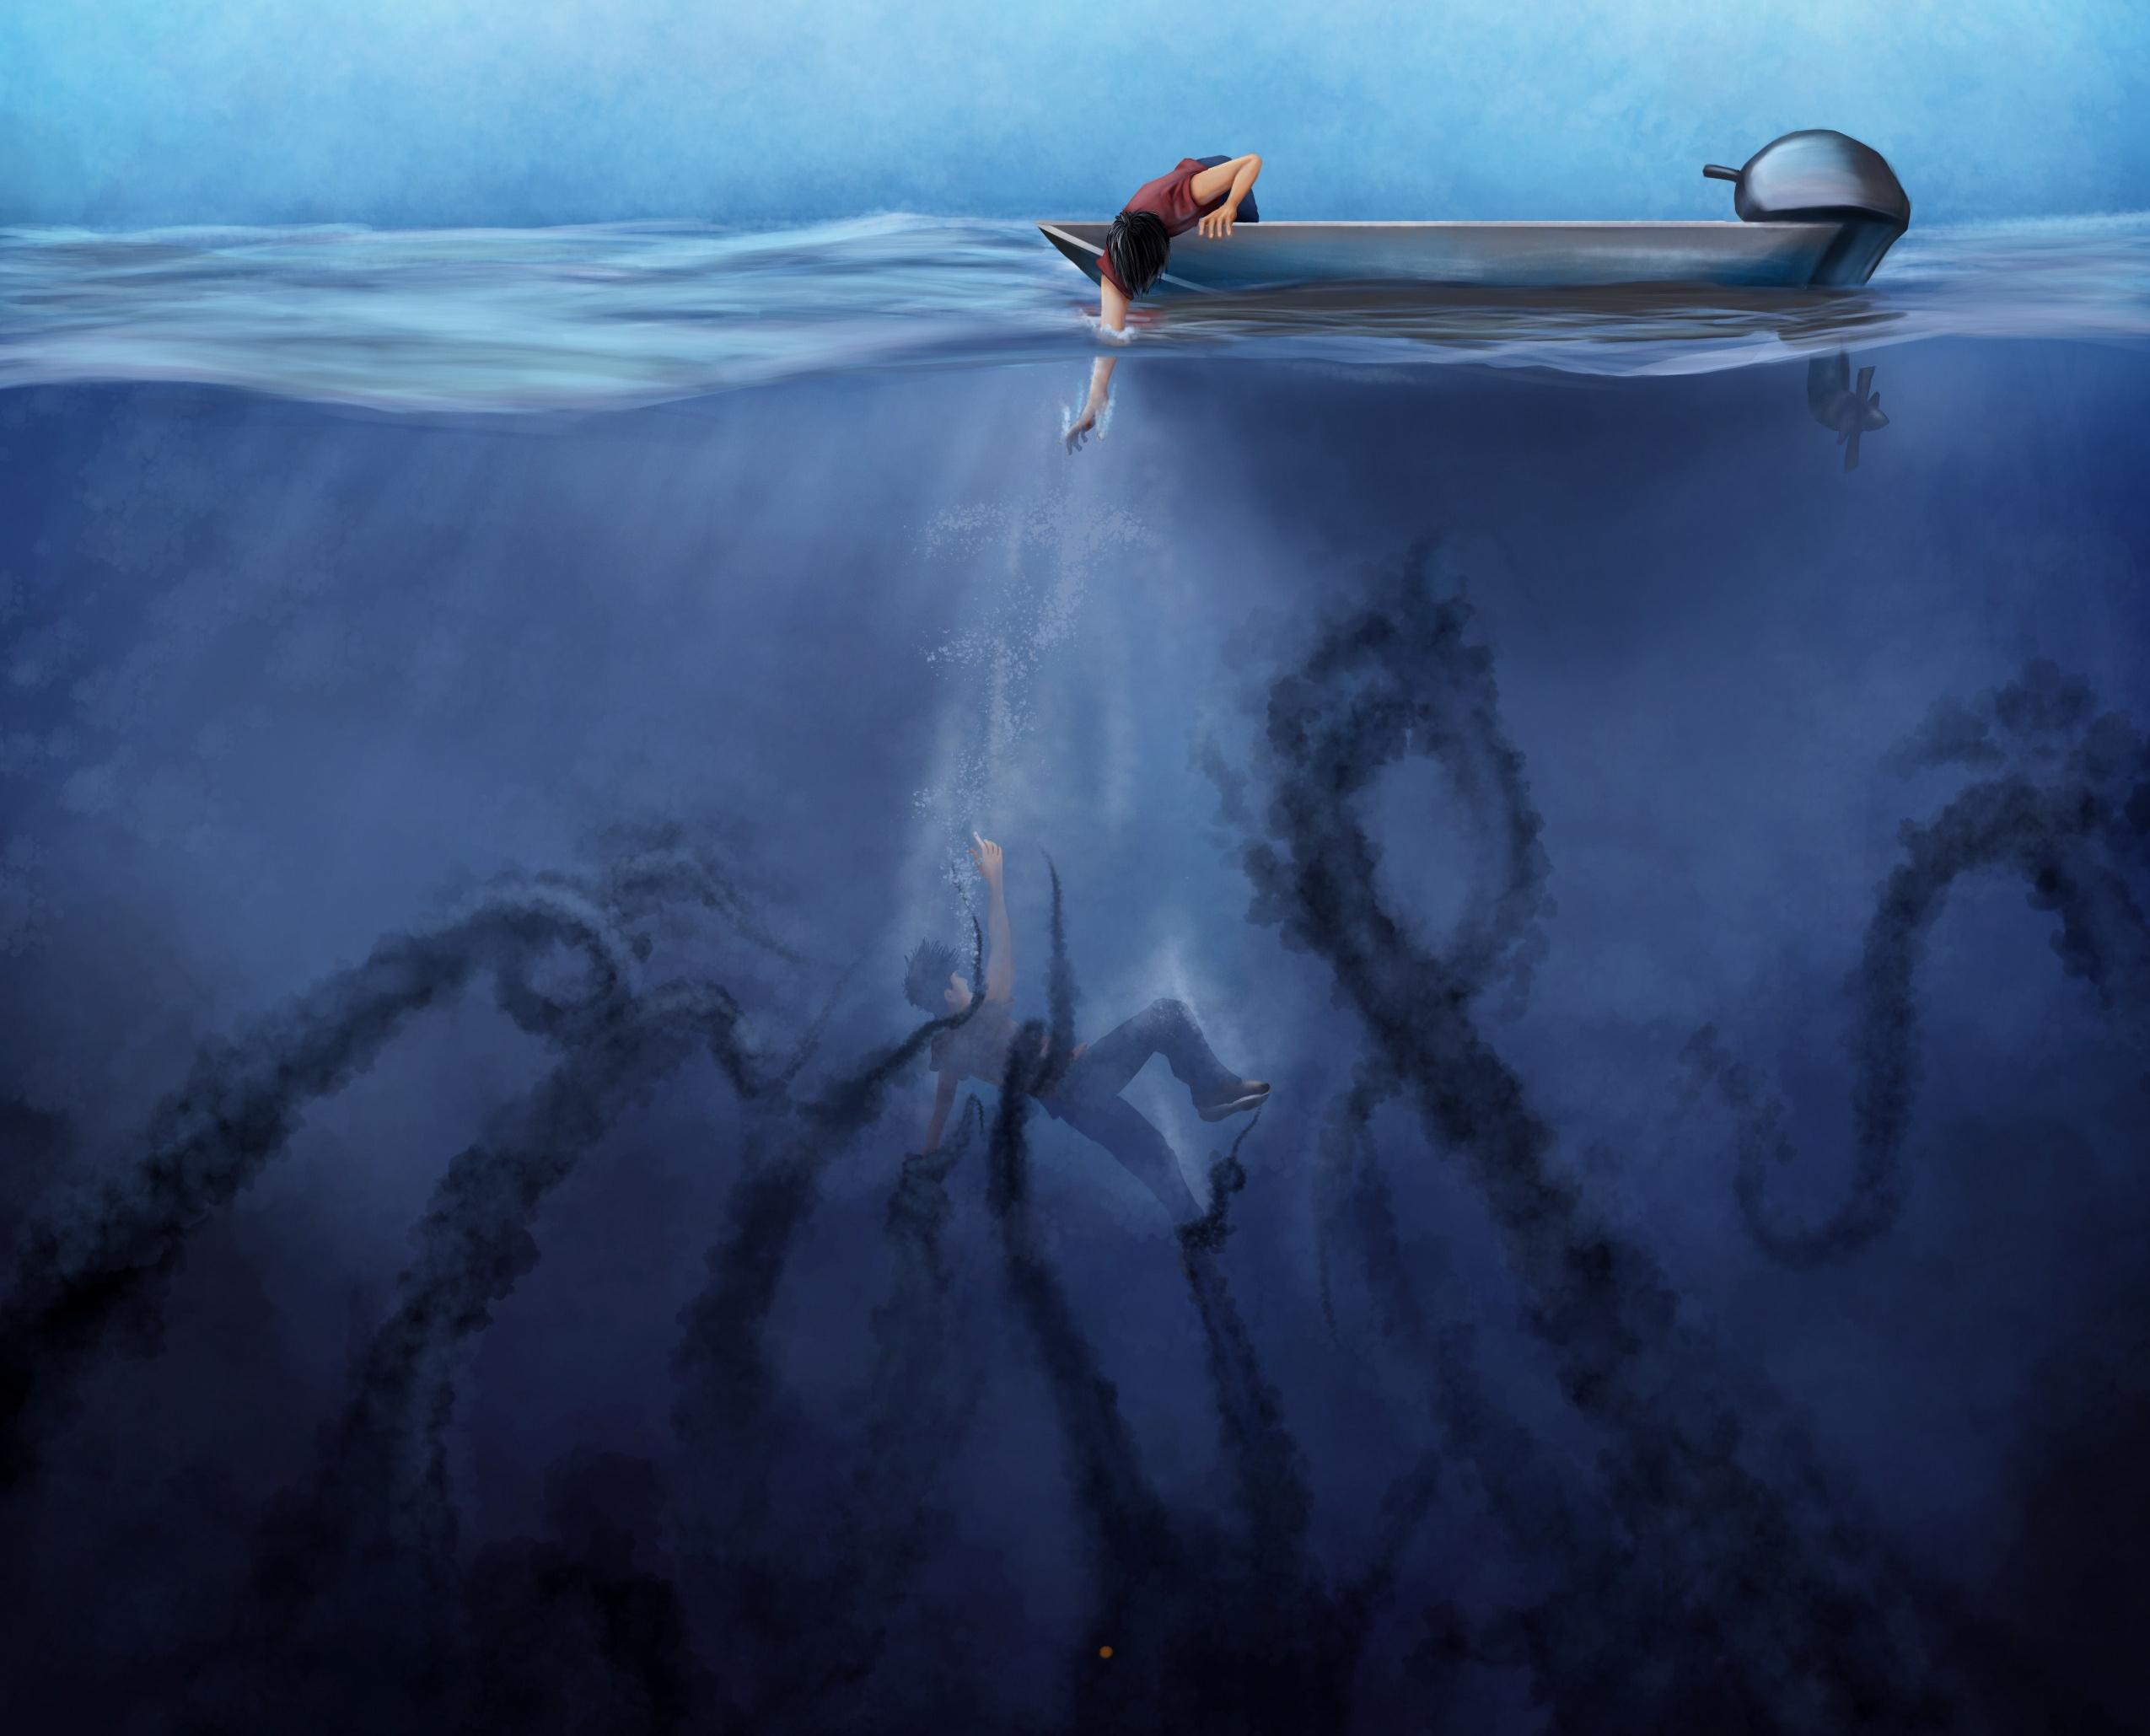 drowning being pulled underwater by dark tentacles